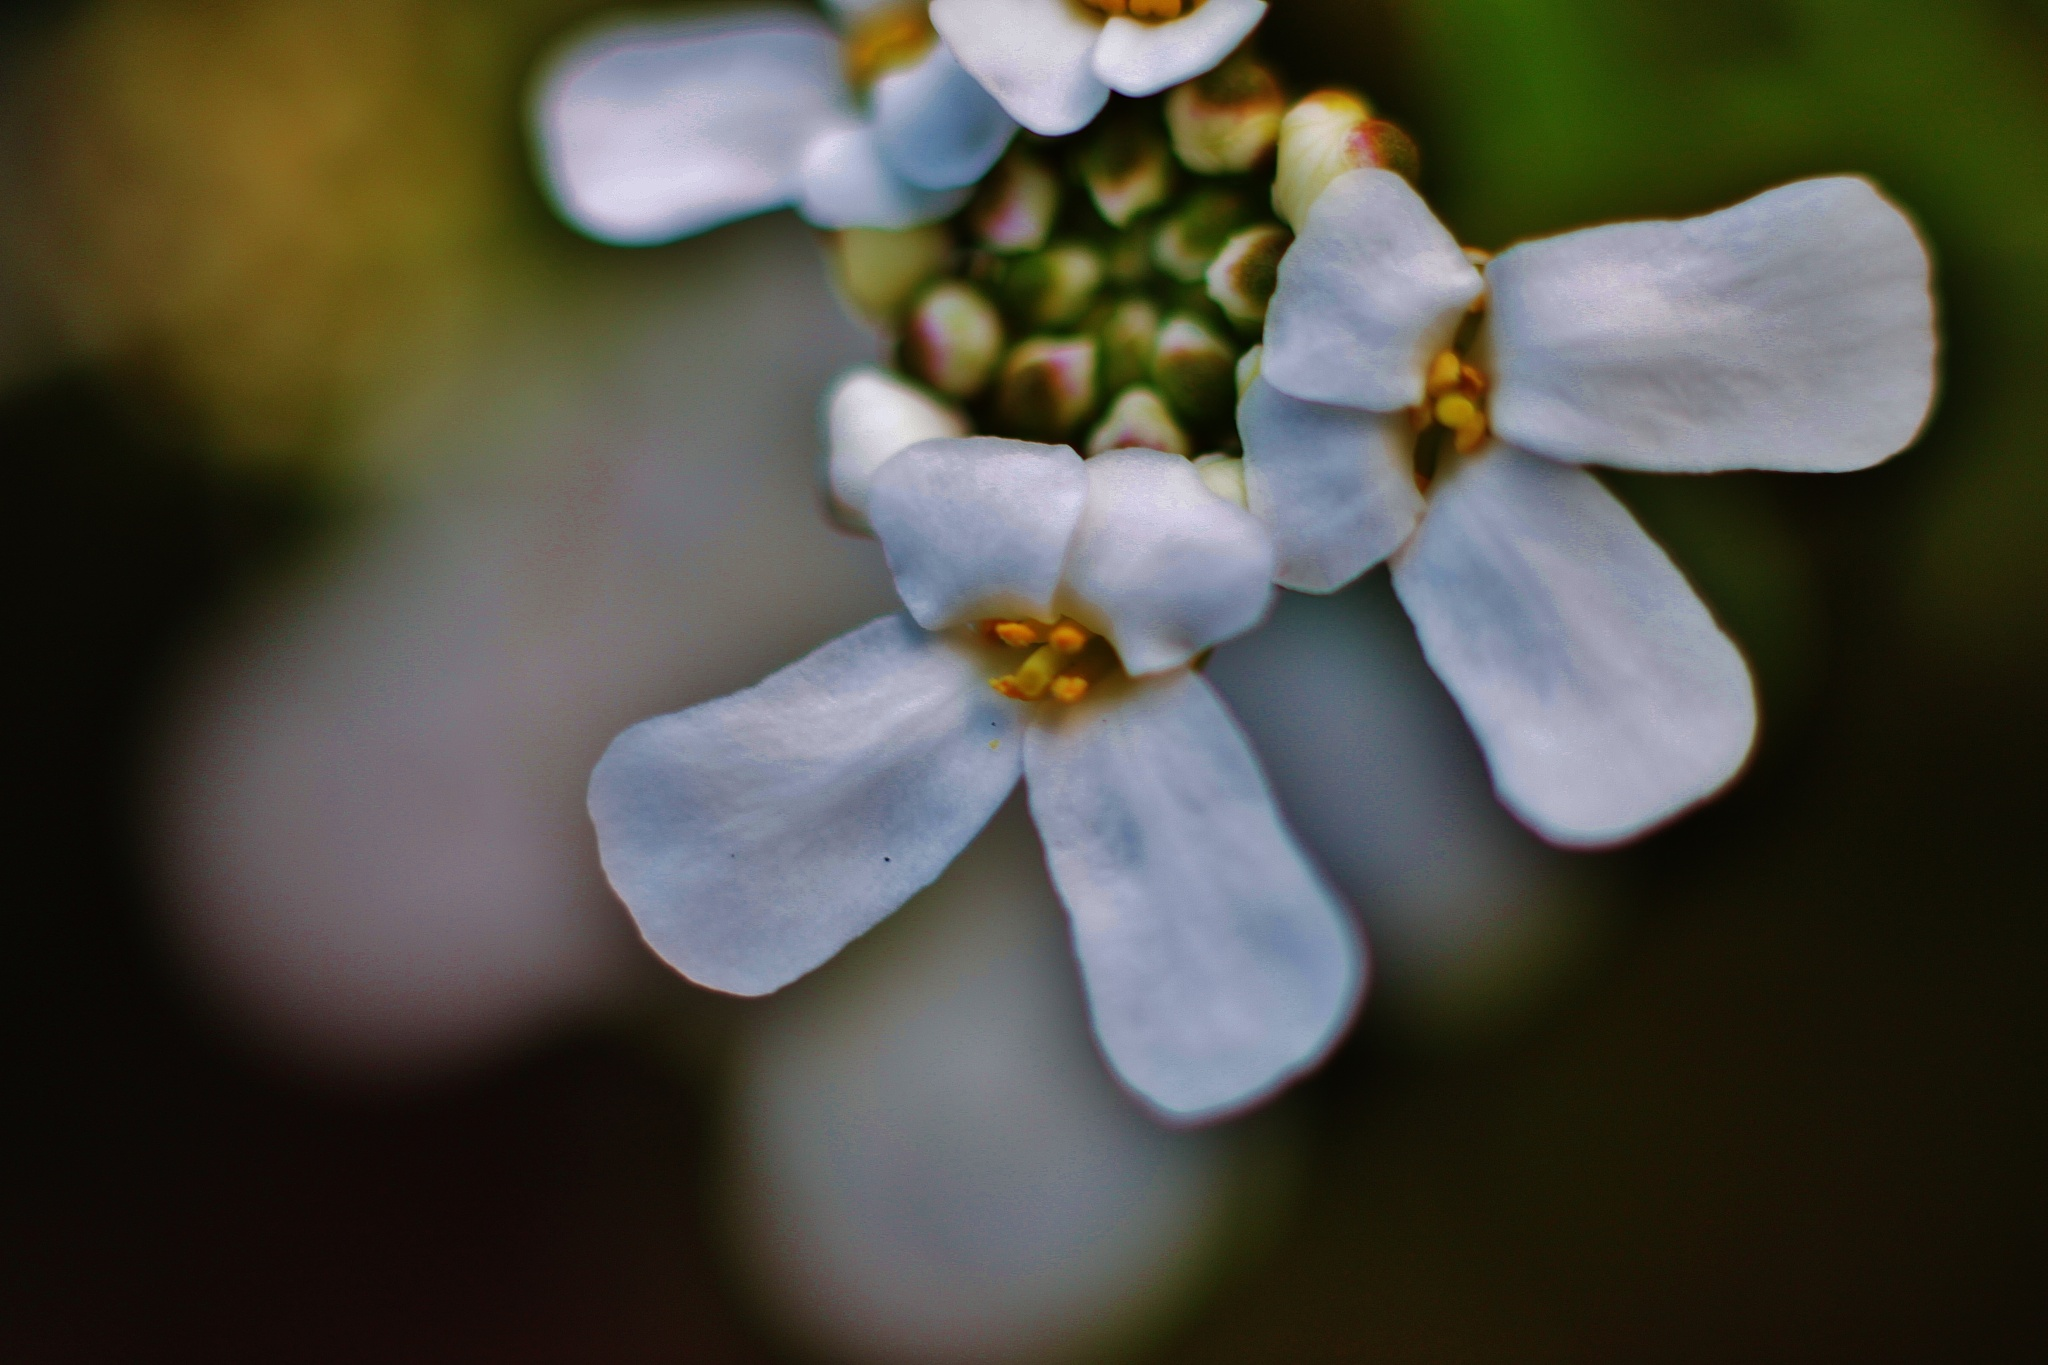 Petites fleurs blanche2,, by Liborio Drogo